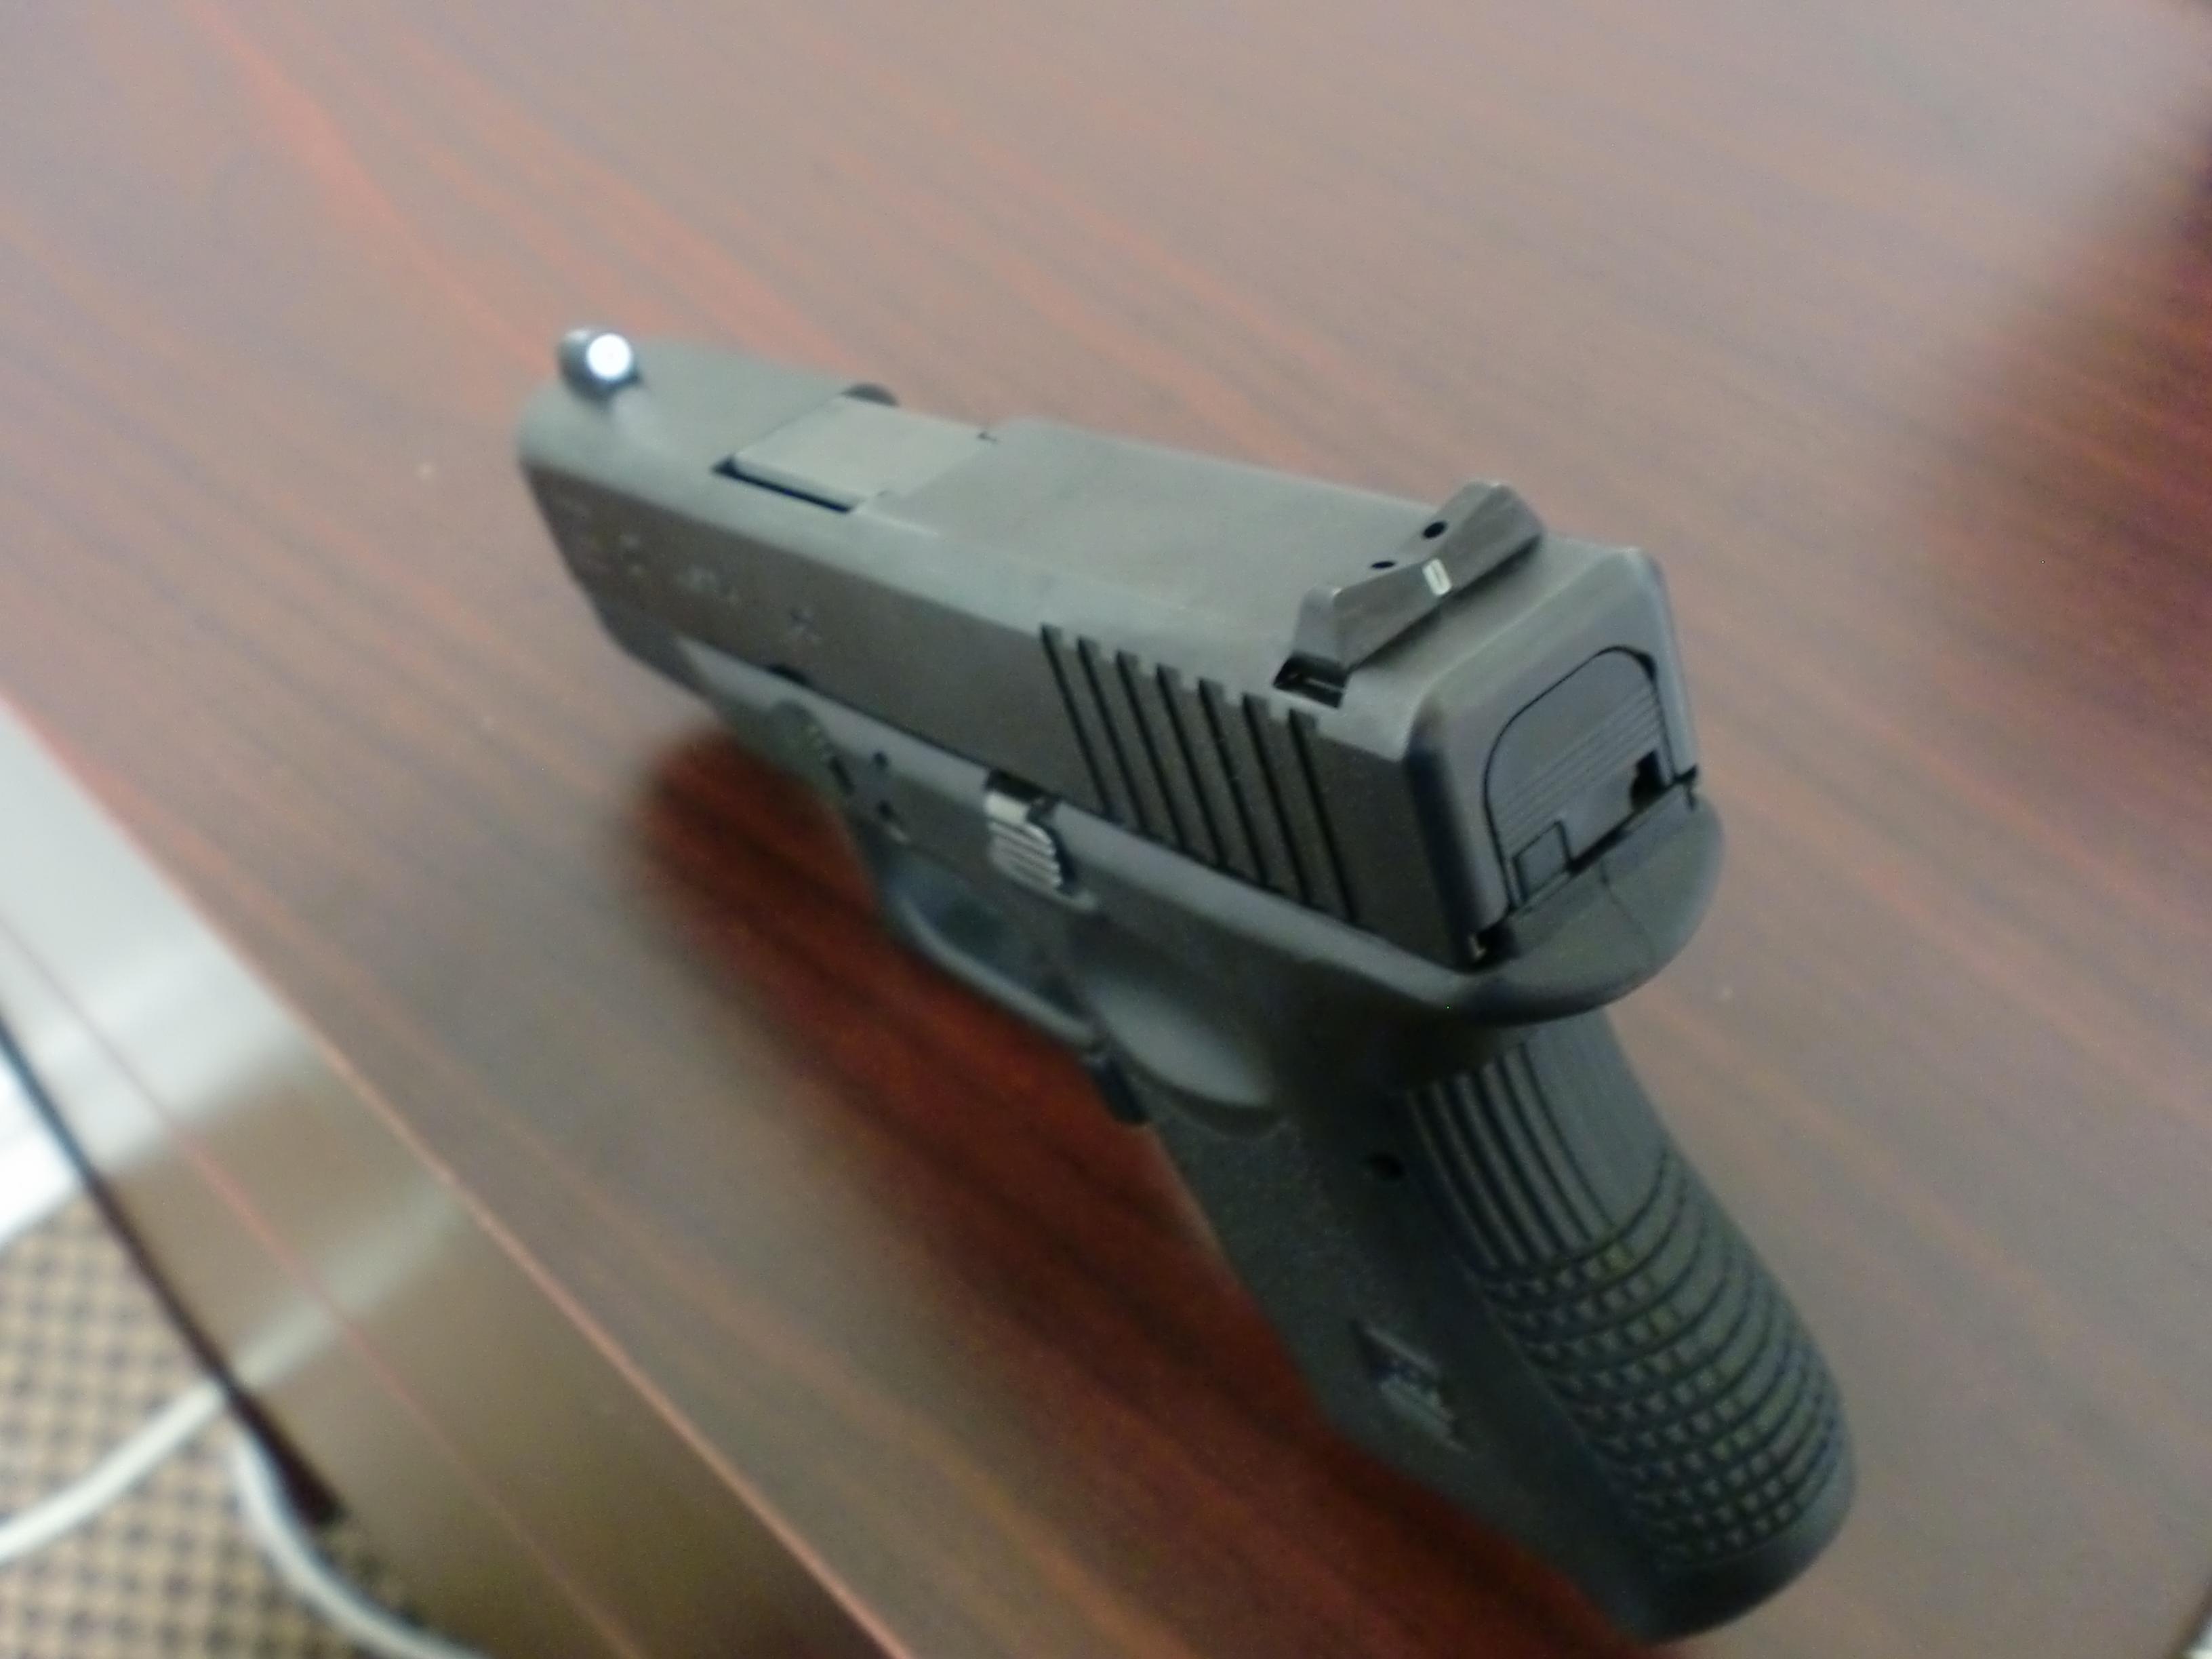 New XS Sights on Glock & LCR PICS-cimg0764.jpg